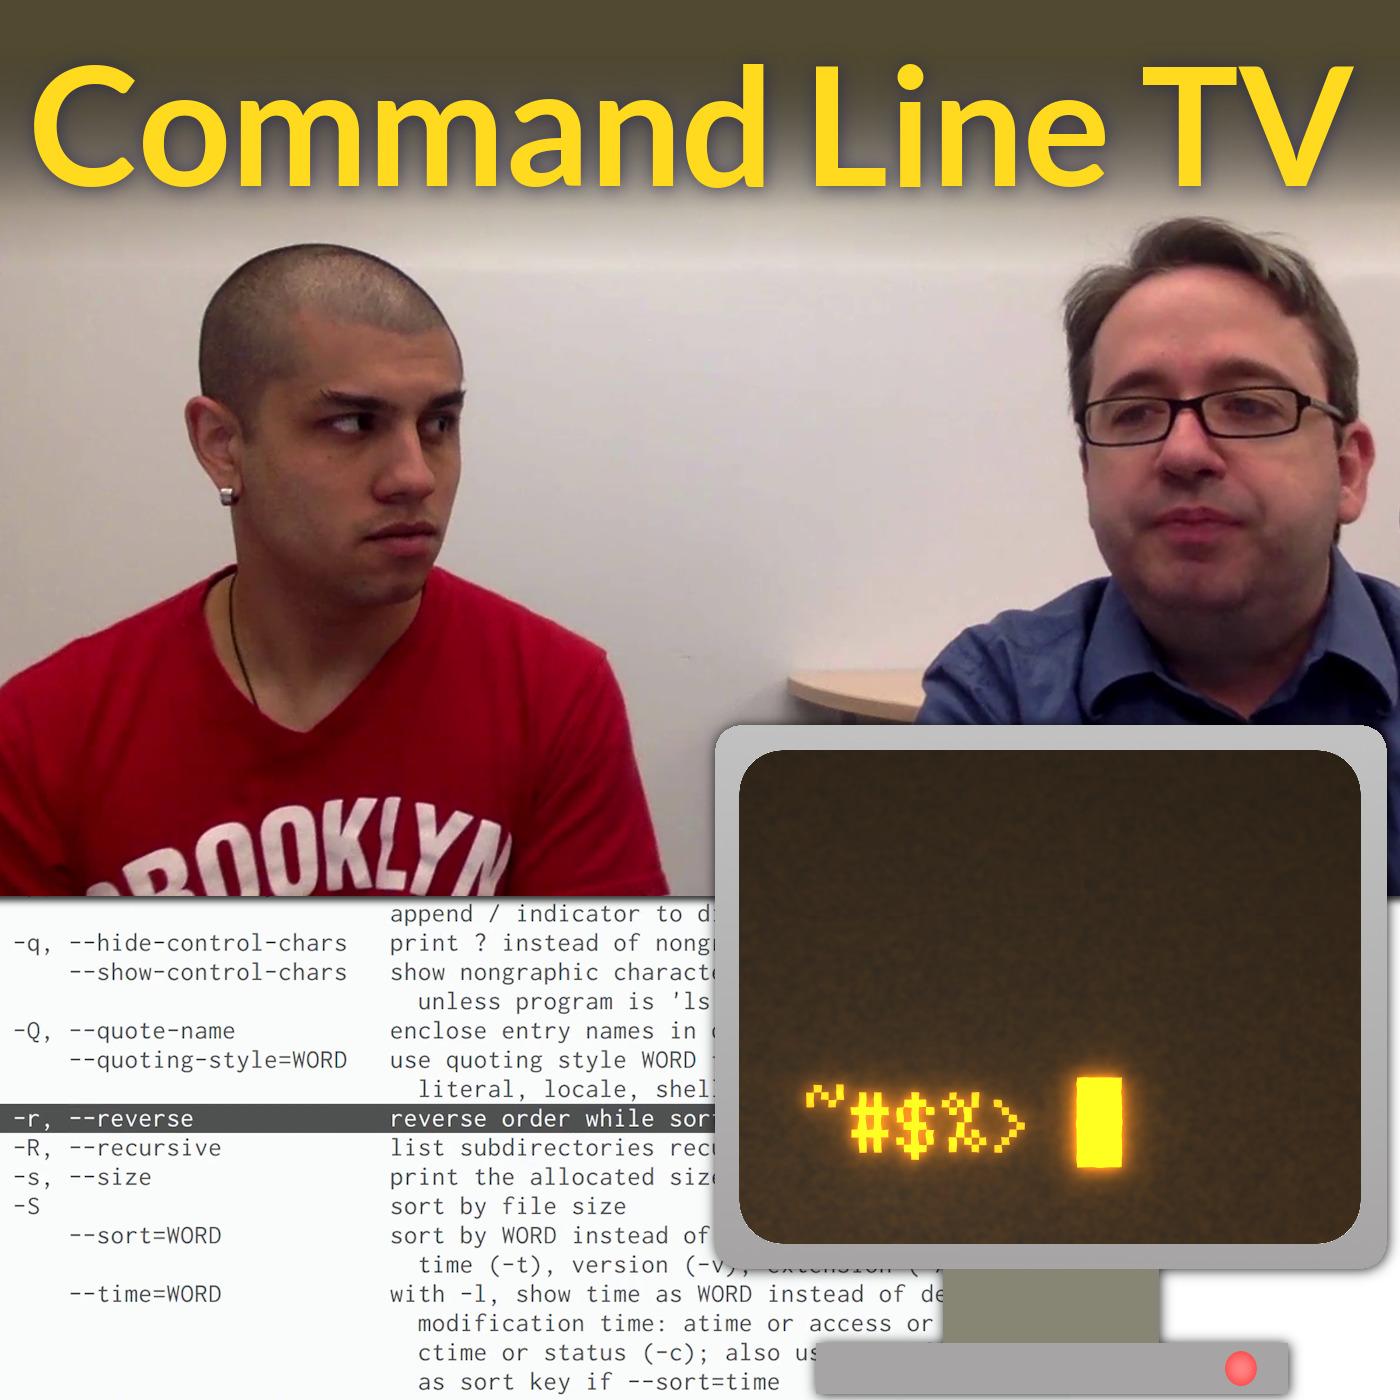 Command Line TV